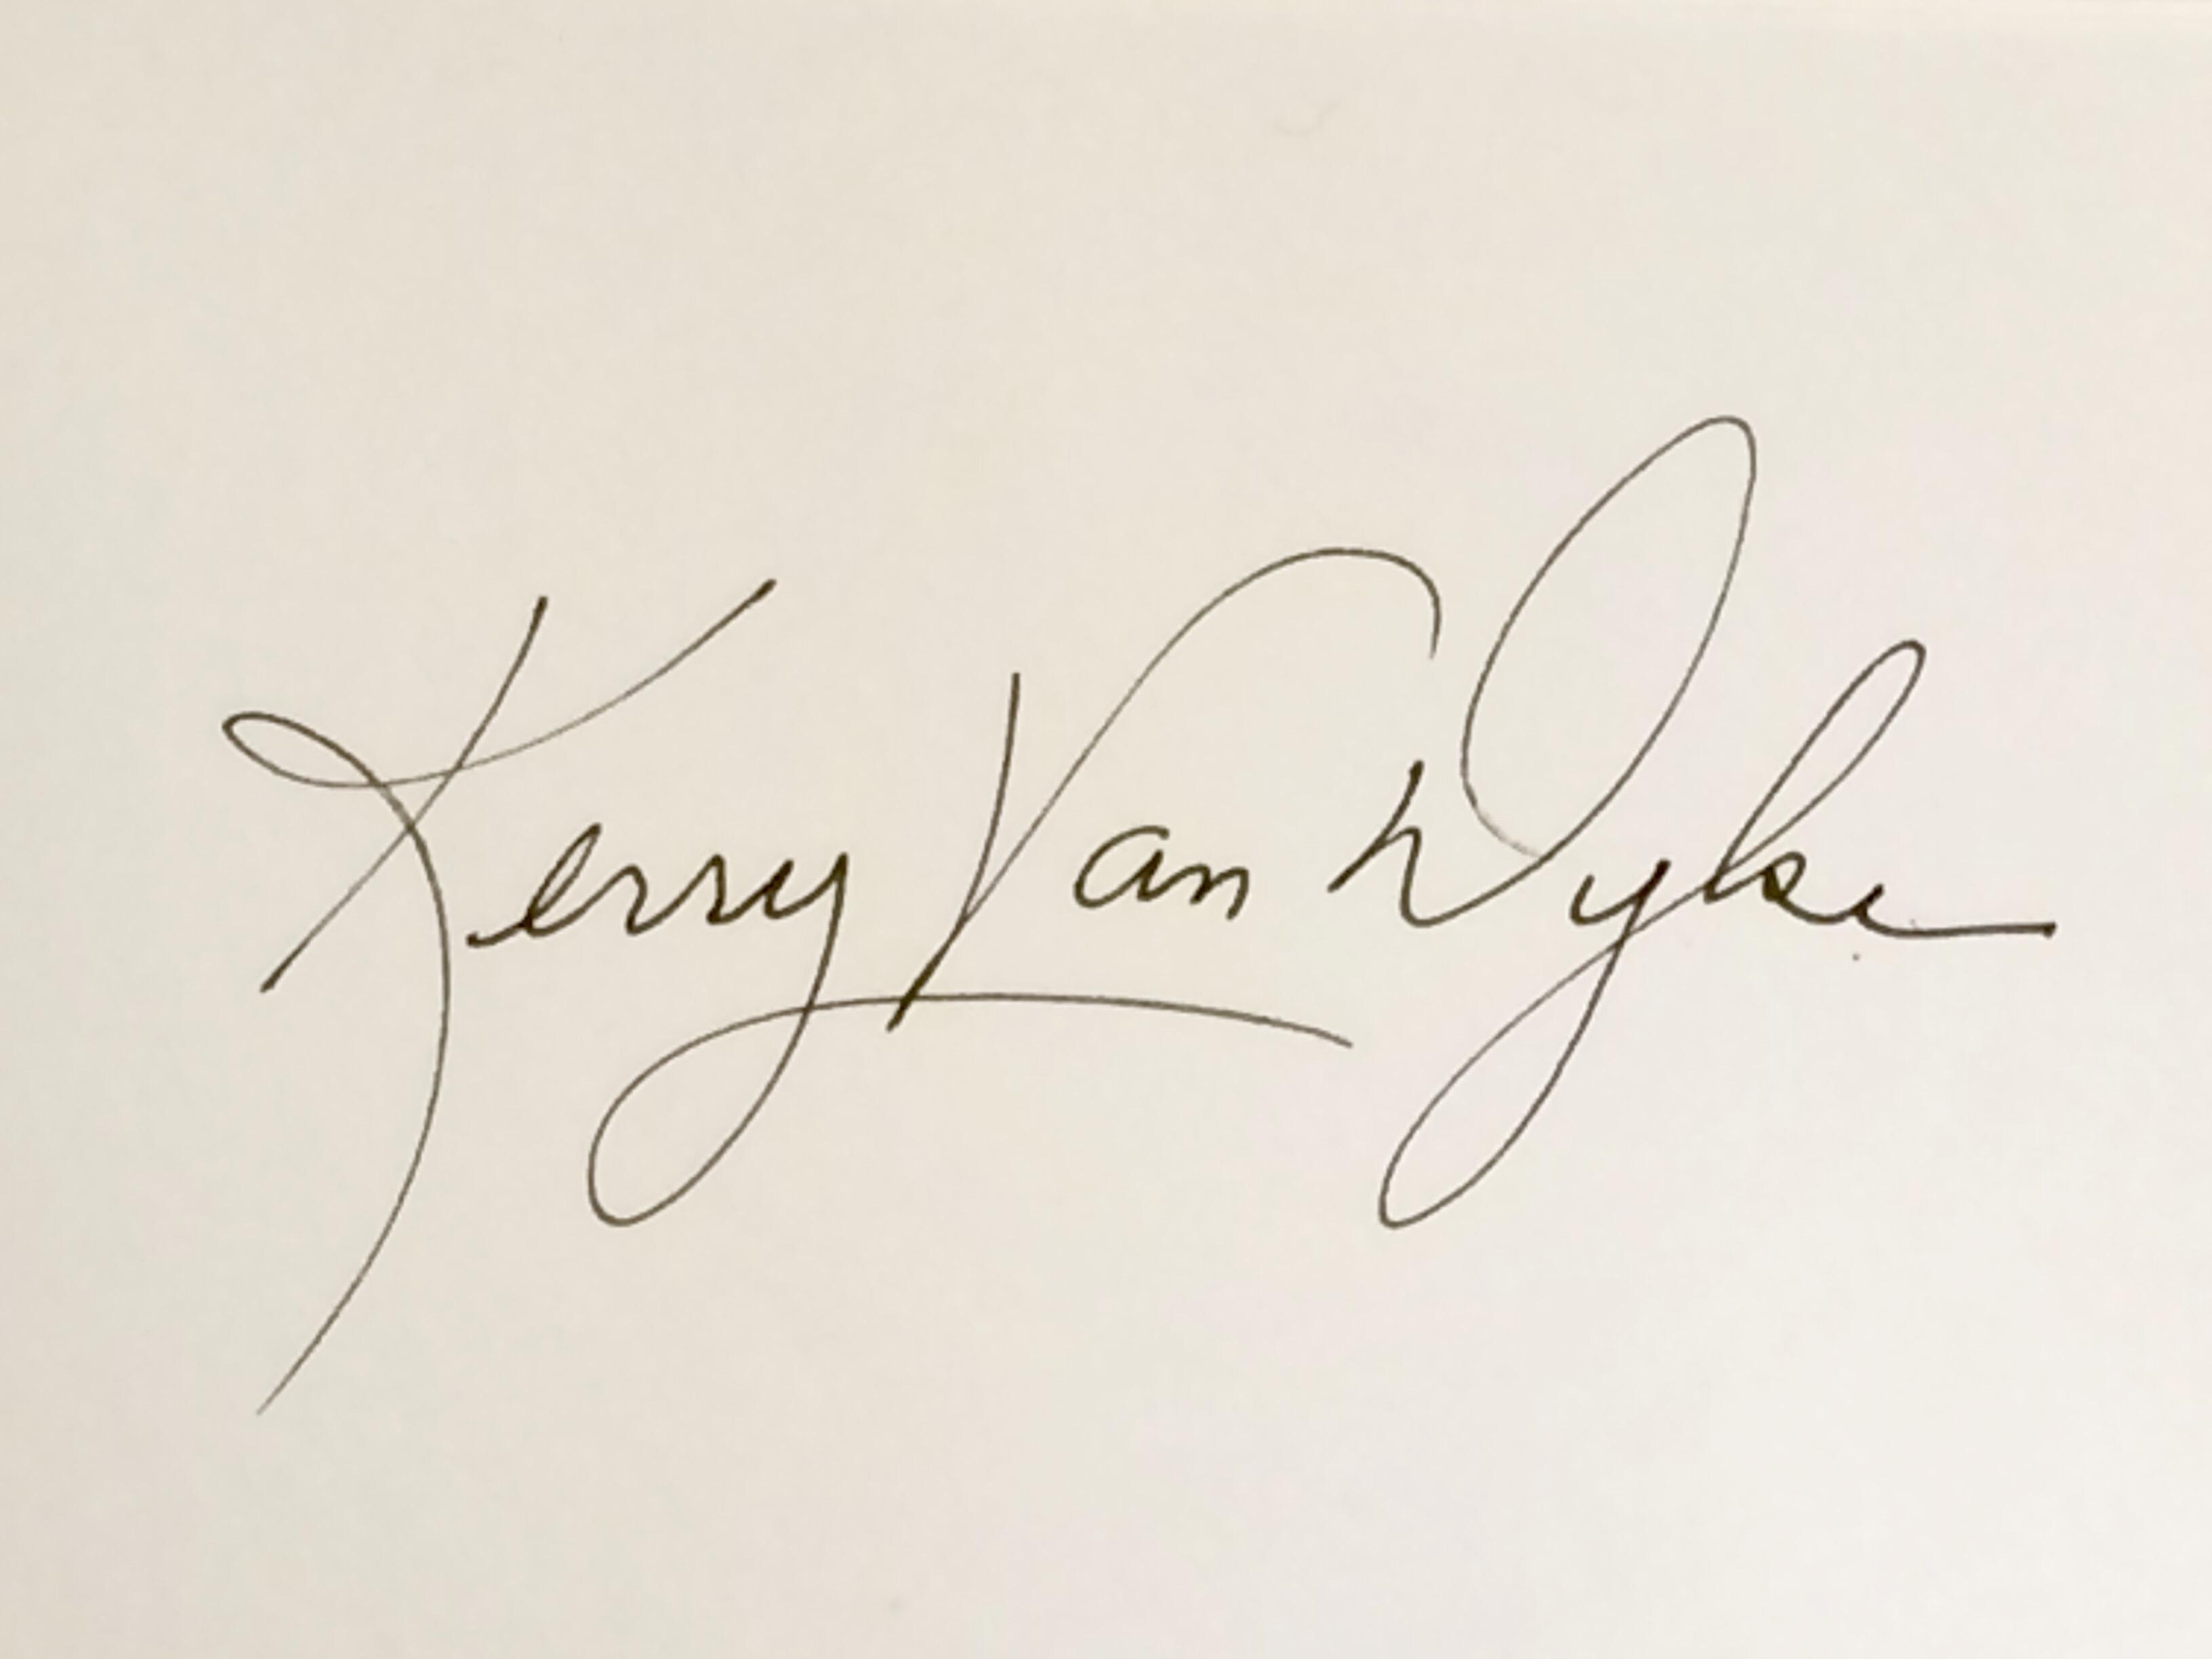 Kerry Van Dyke's Signature